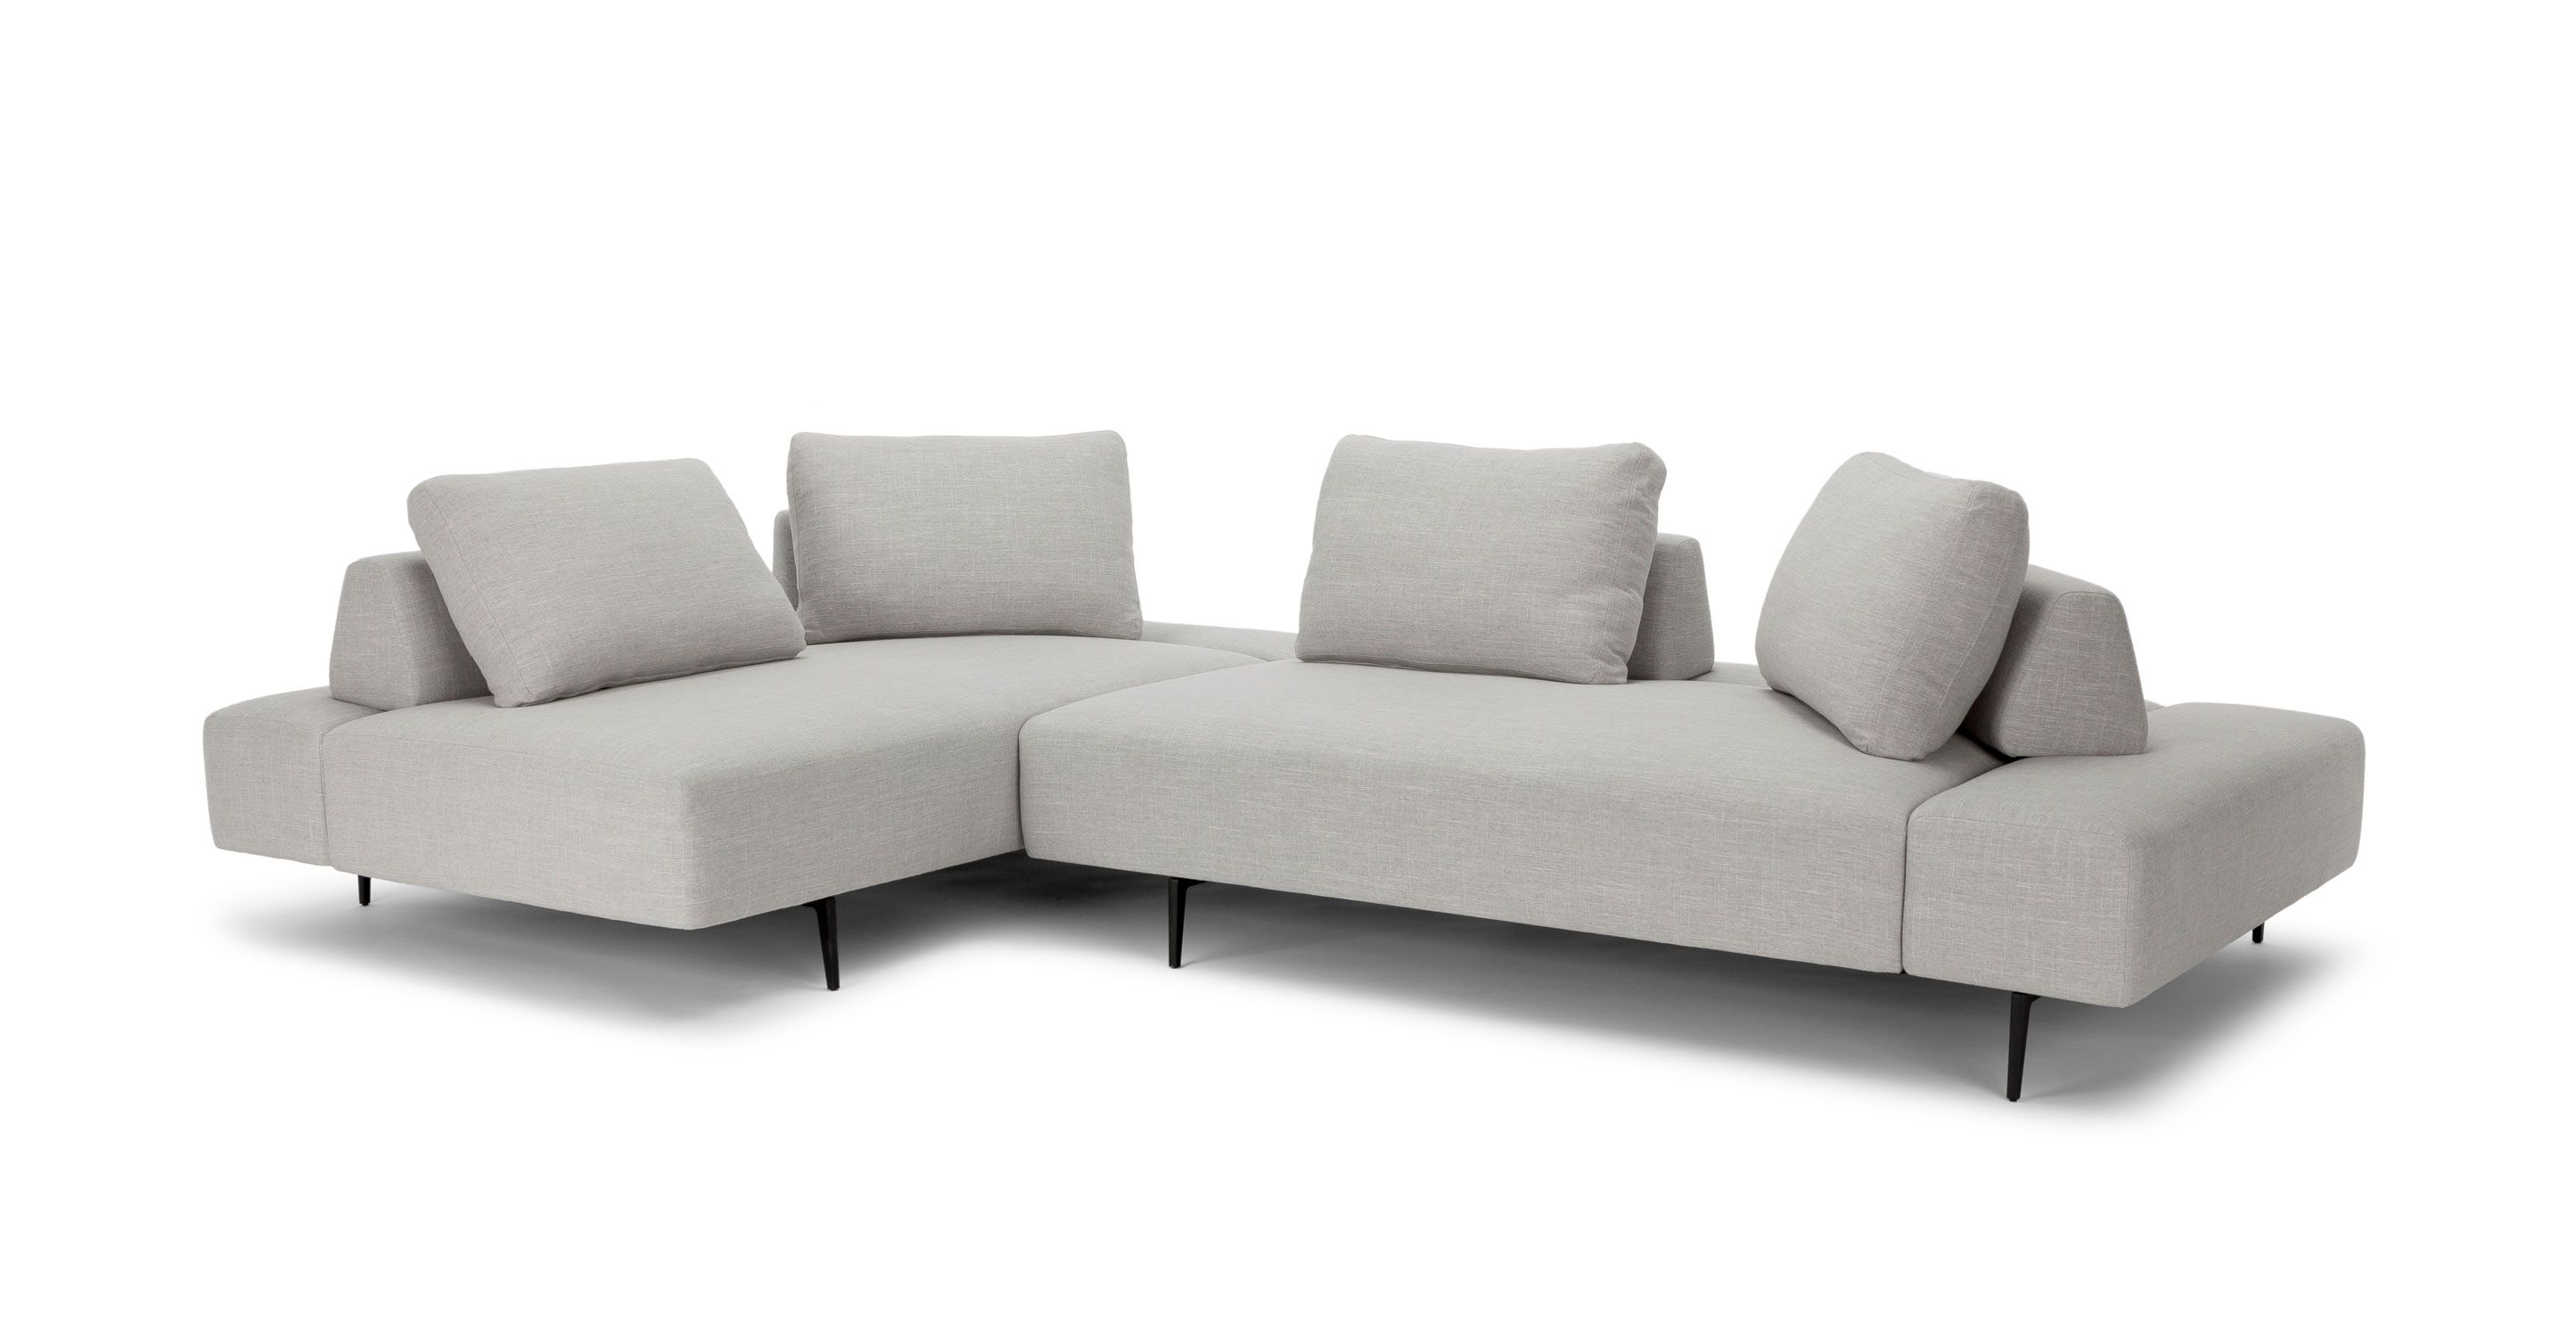 Divan Mist Gray Left Sectional Mid Century Modern Sectional Sofa